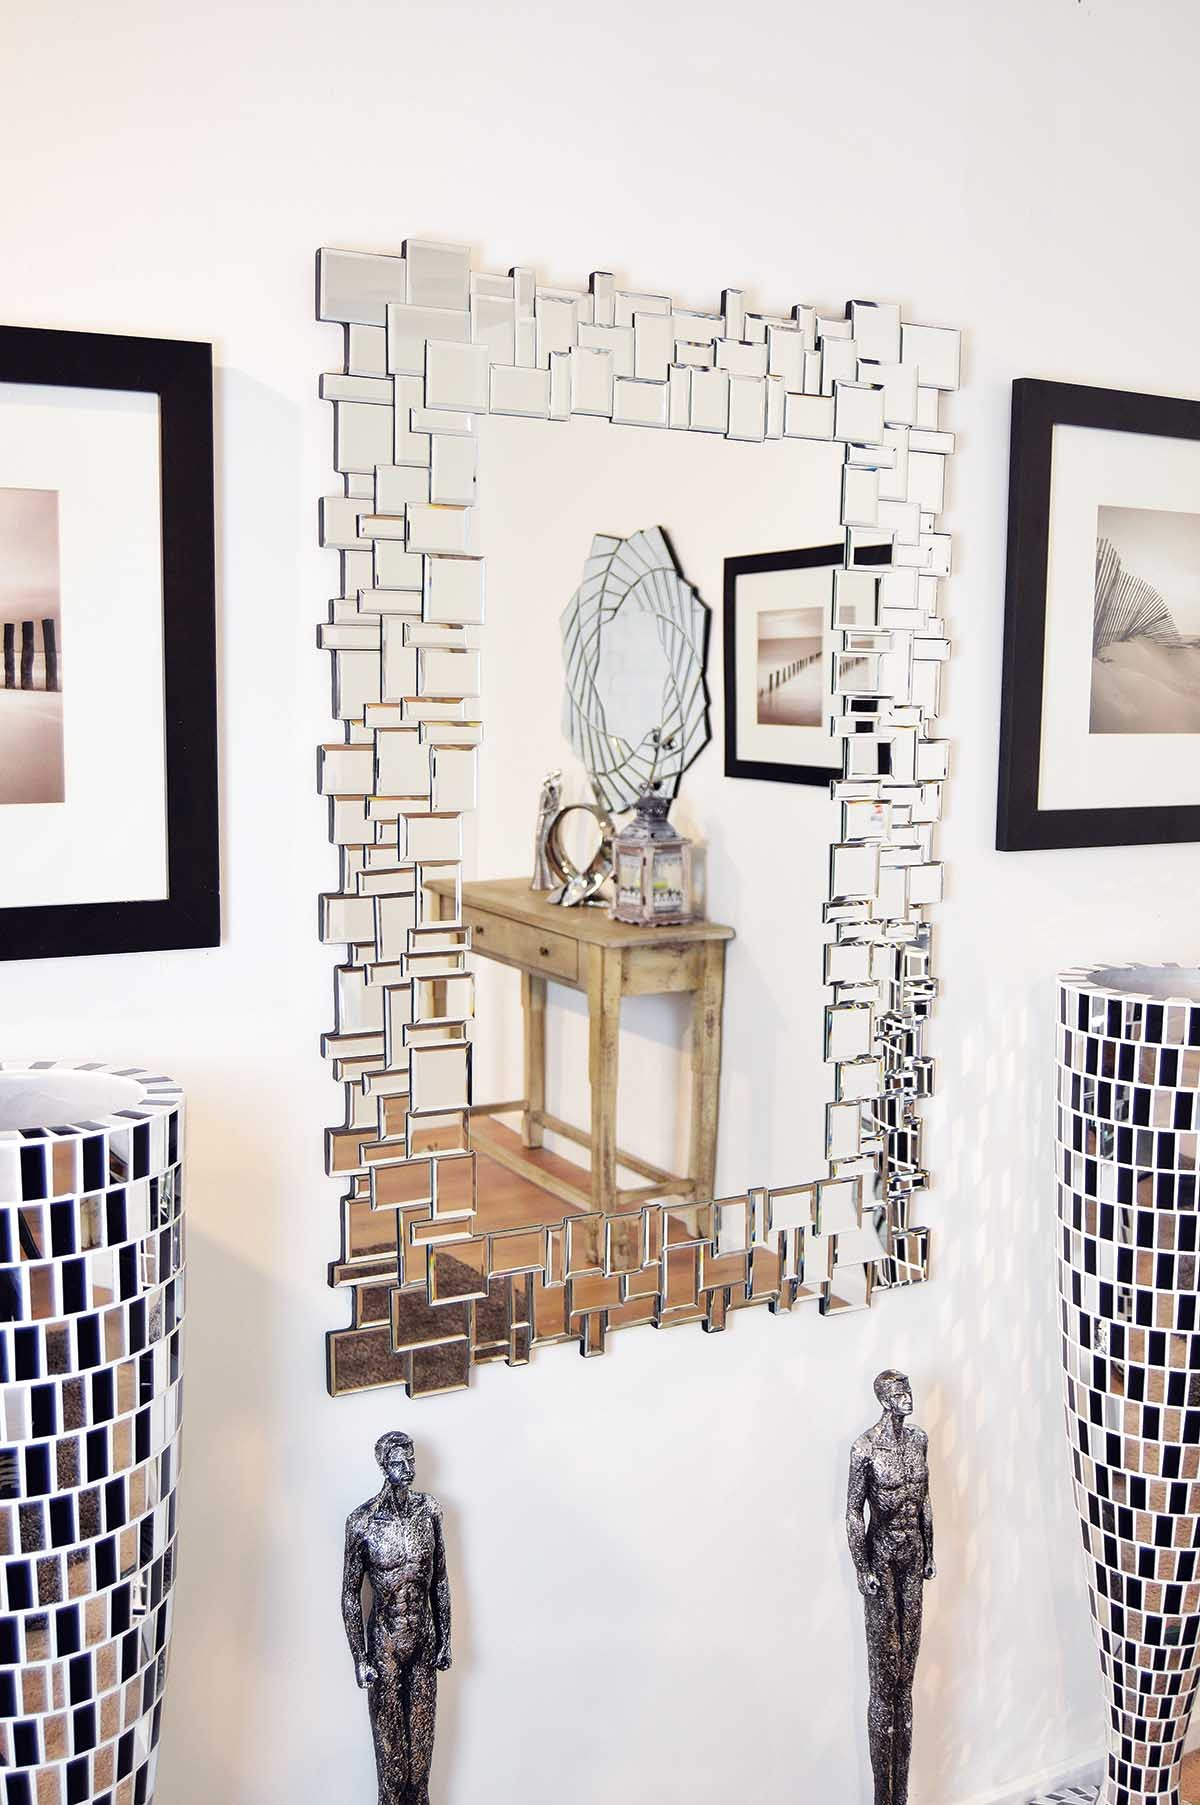 Venetain Block Glass Frame Modern Large Wall Mirror 3Ft11 X 2Ft8